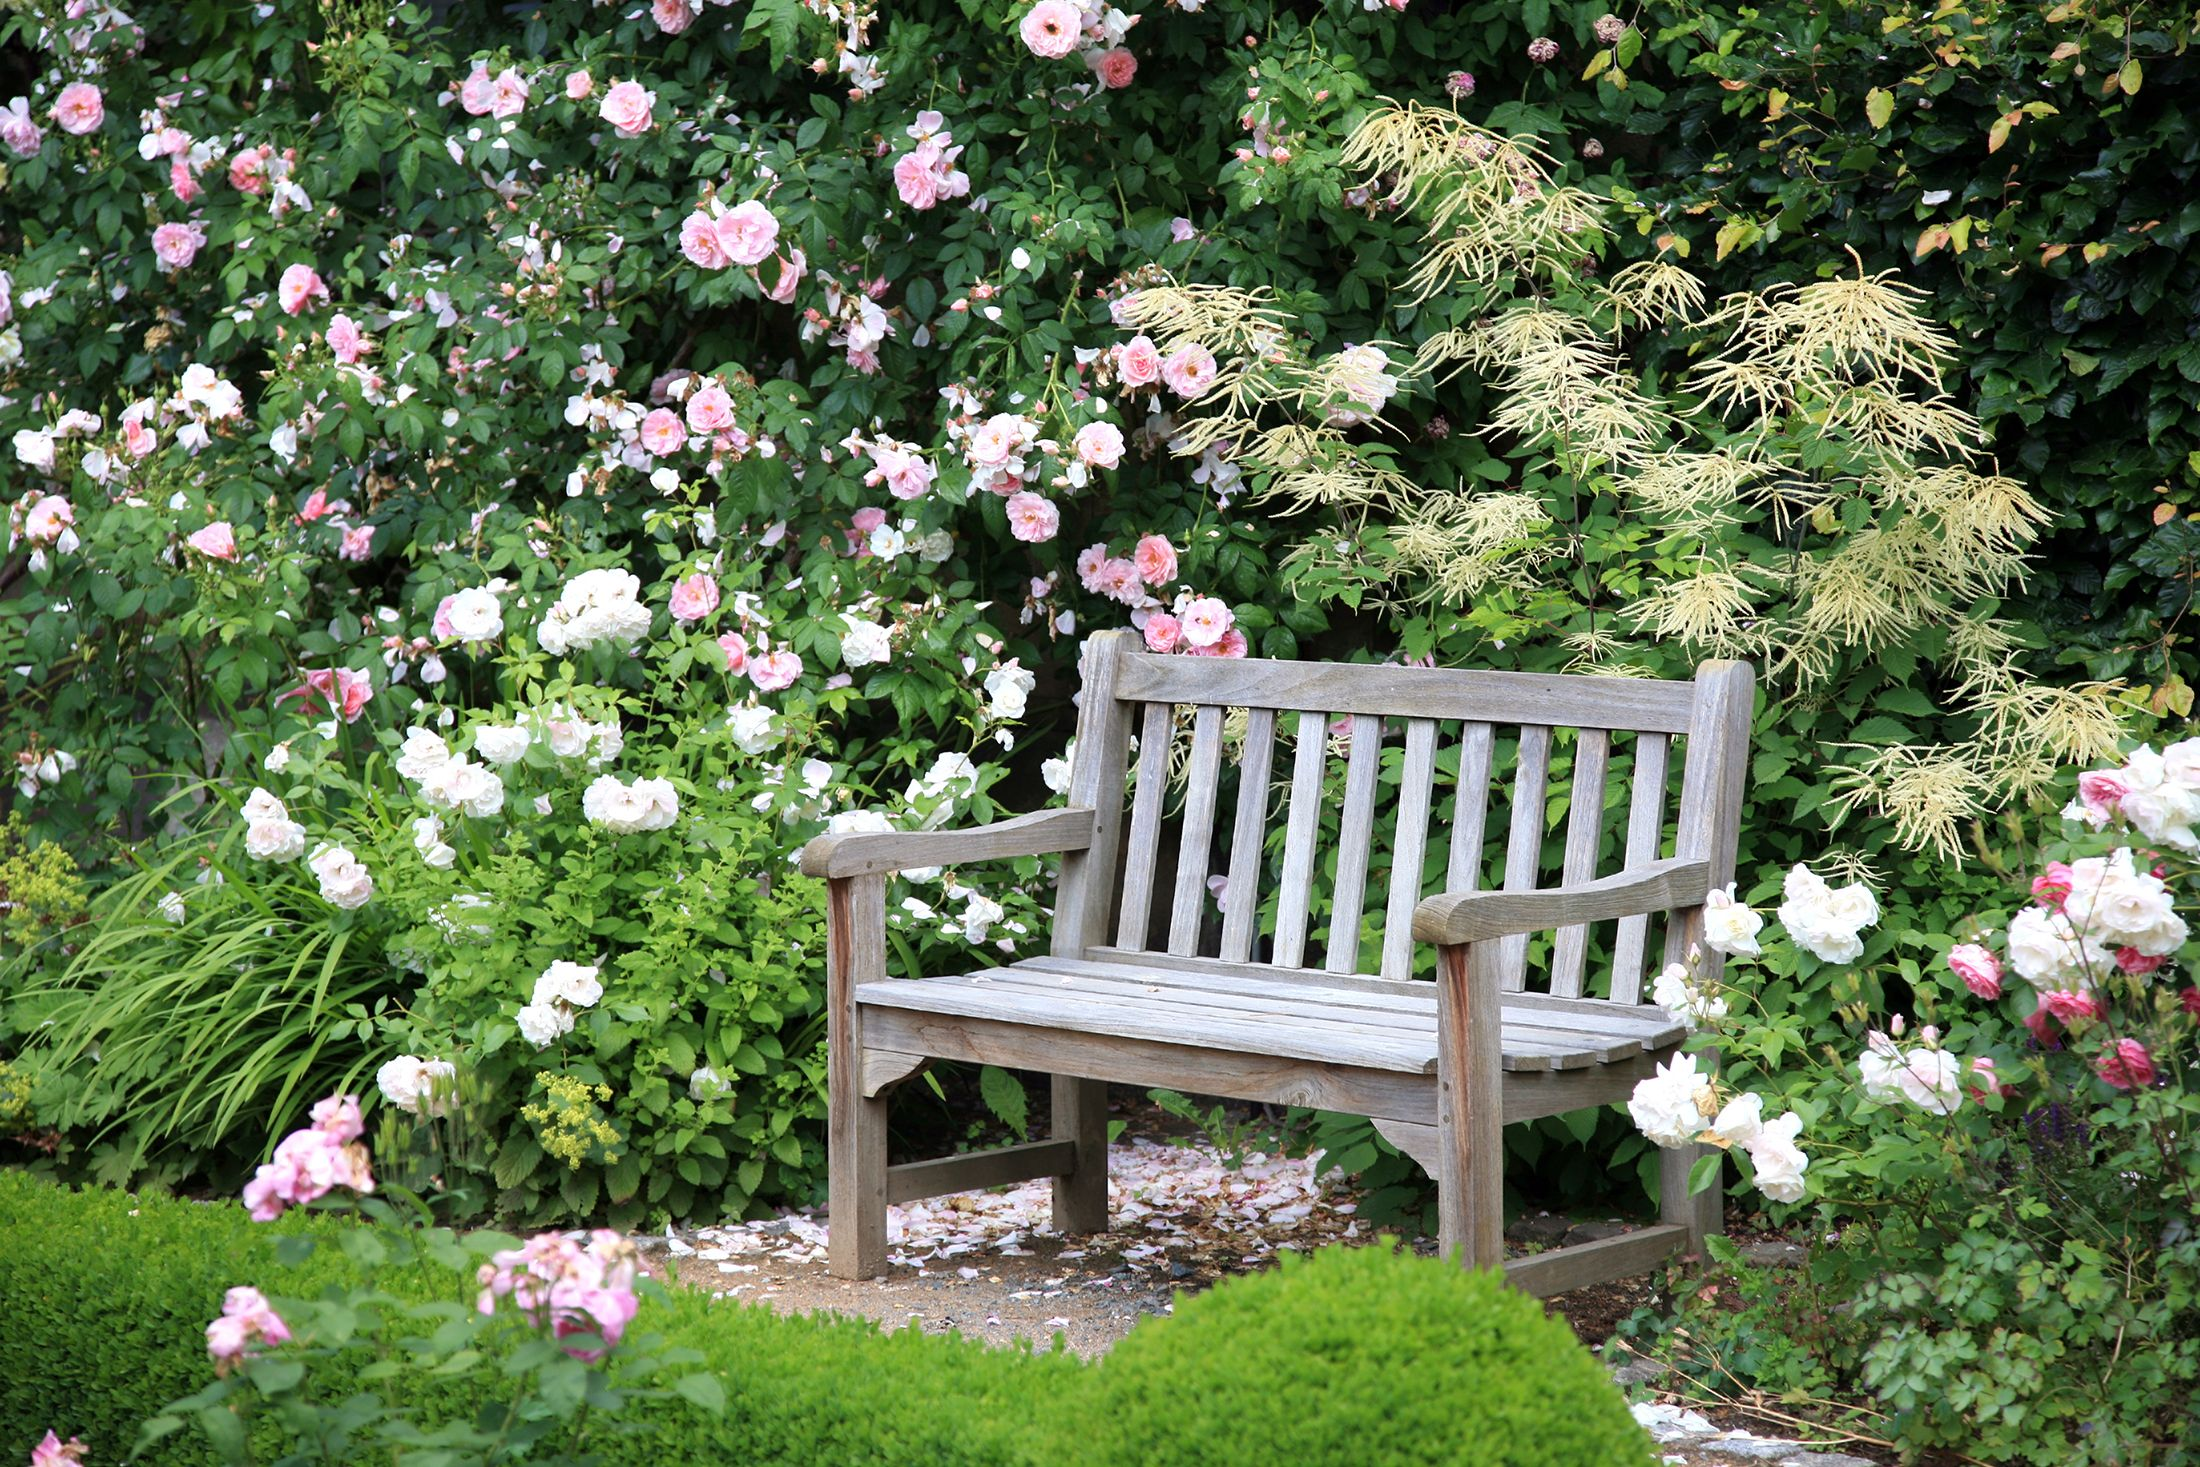 15 Best English Garden Design Ideas How To Make An English Garden Landscape